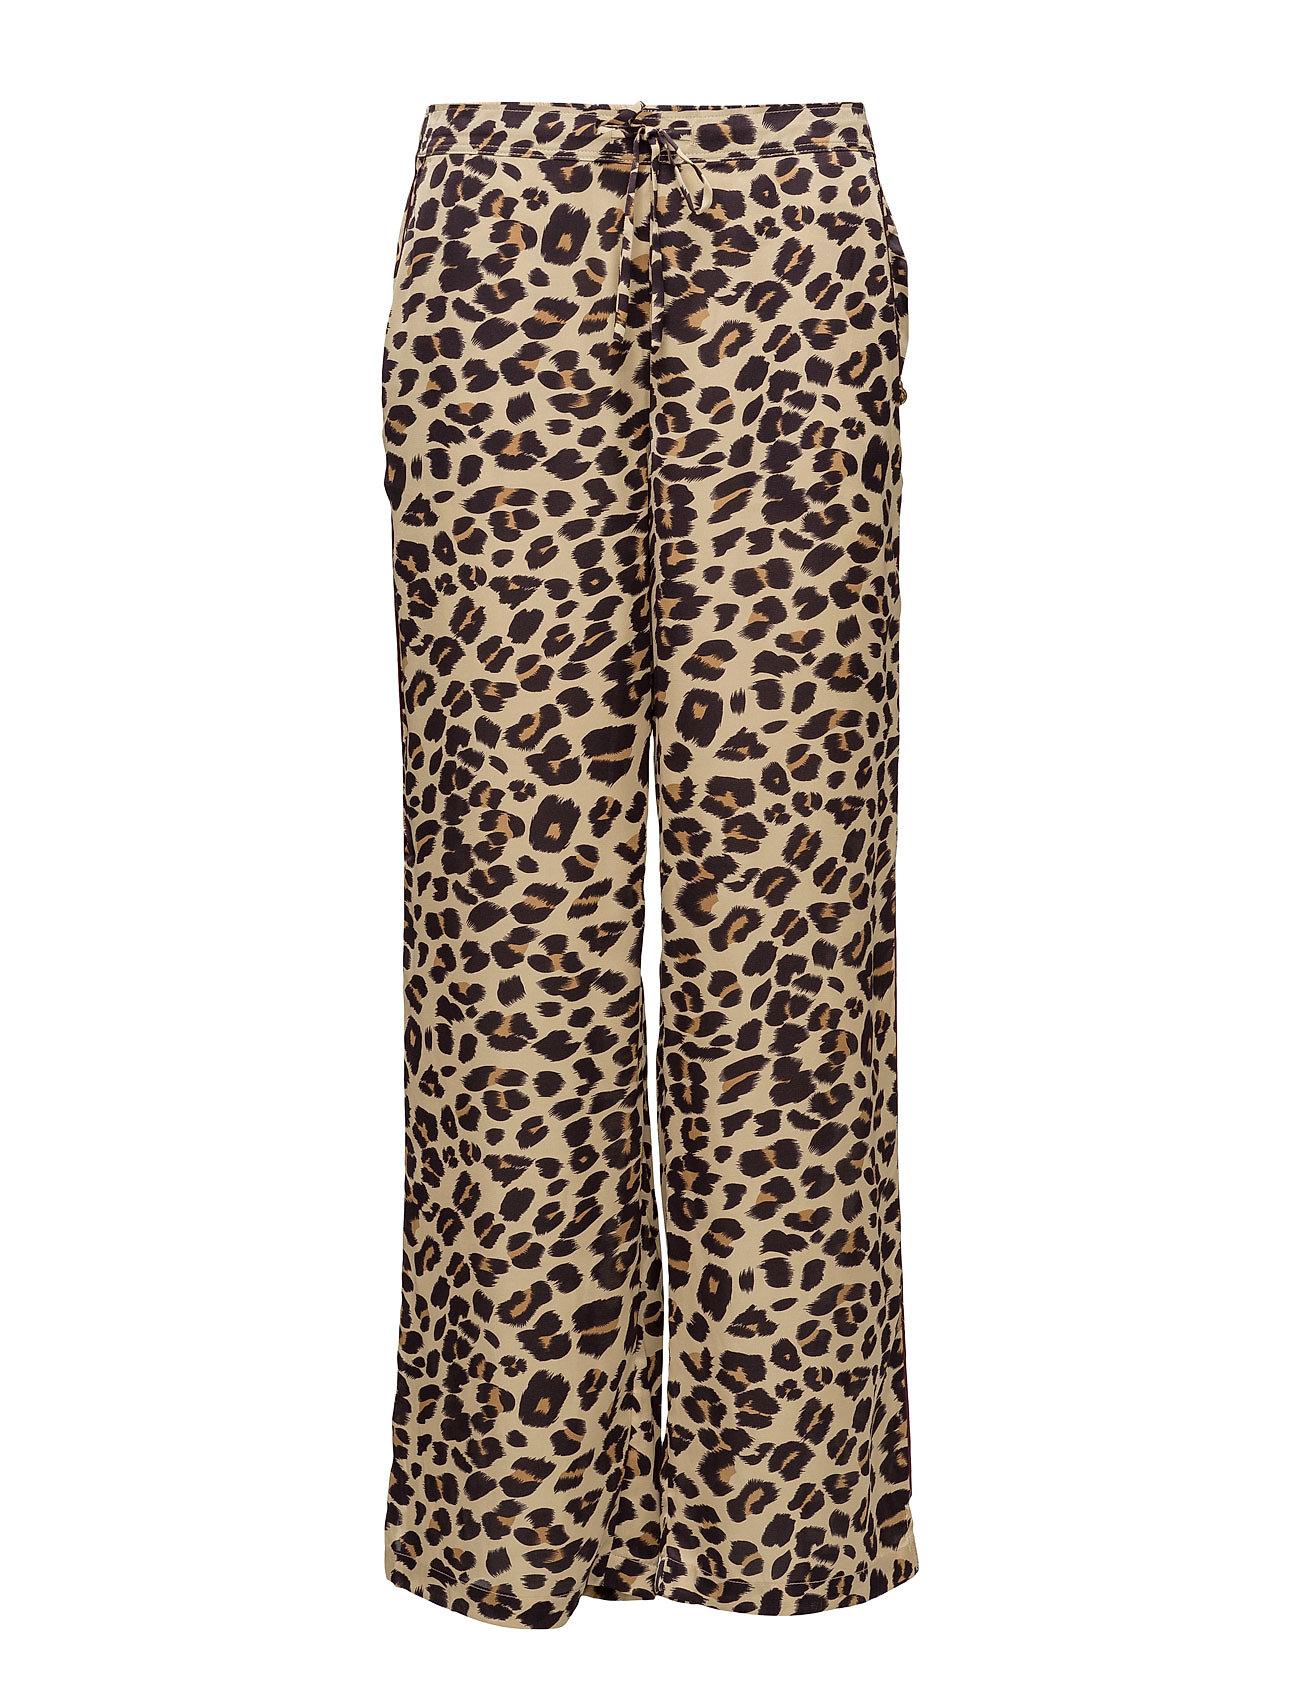 Silky Feel Pyjama Pant With Contrast Piping Scotch & Soda Trompetbukser til Damer i